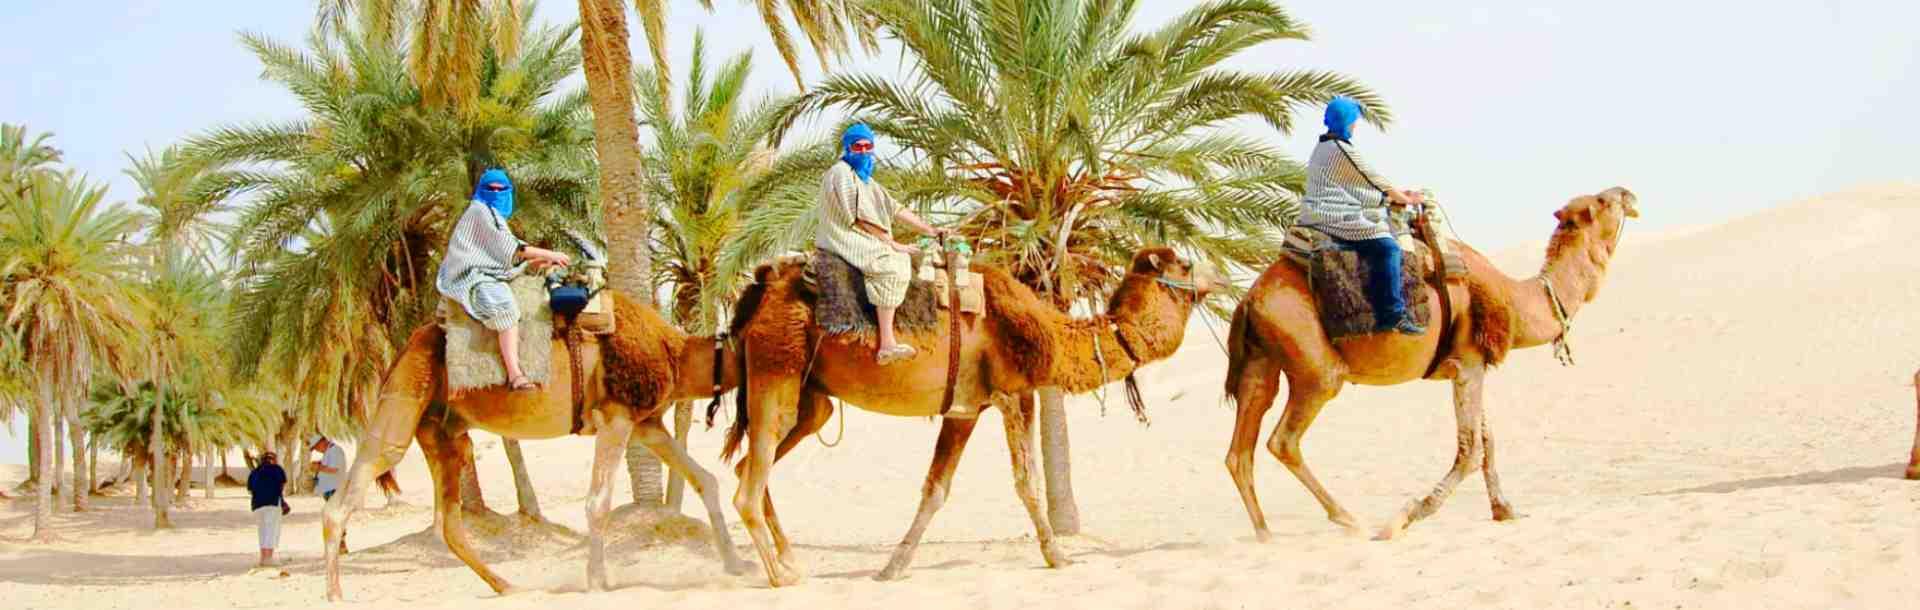 Монастир, Экскурсии на верблюдах